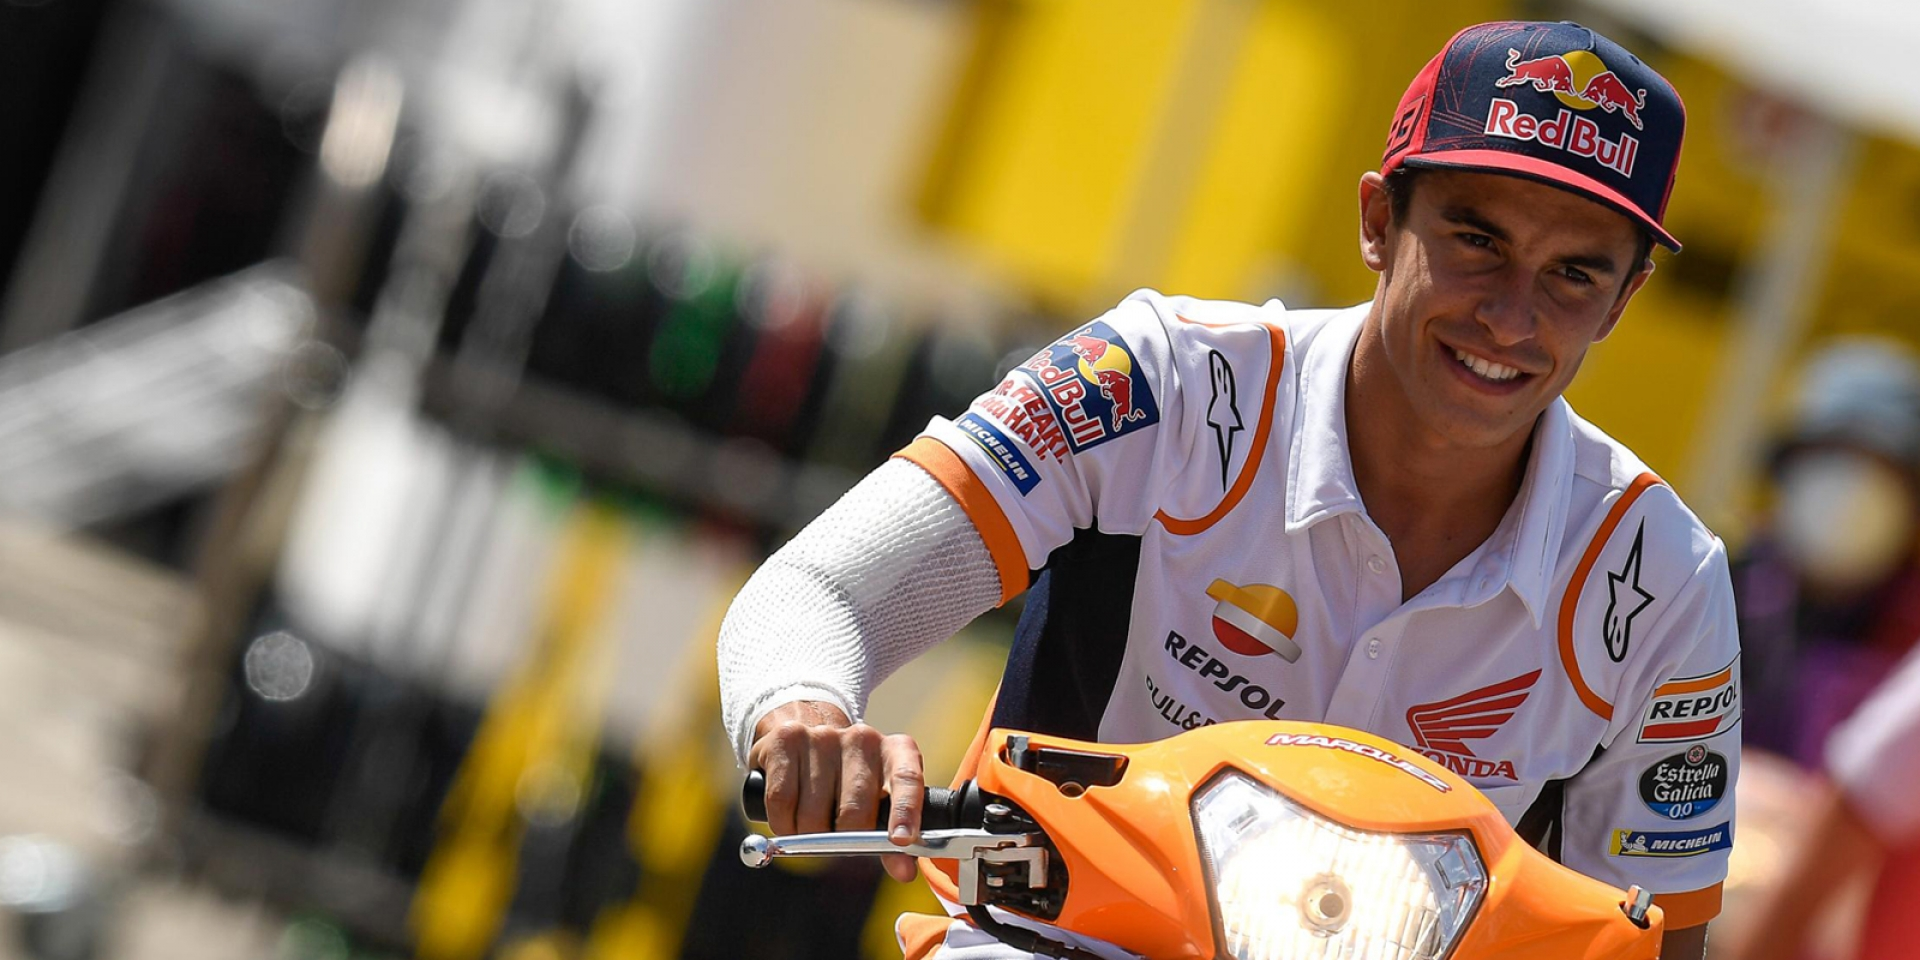 Marc Marquez本季報銷?手傷休養2-3個月,PUIG:「Marquez痊癒後才會復出!」